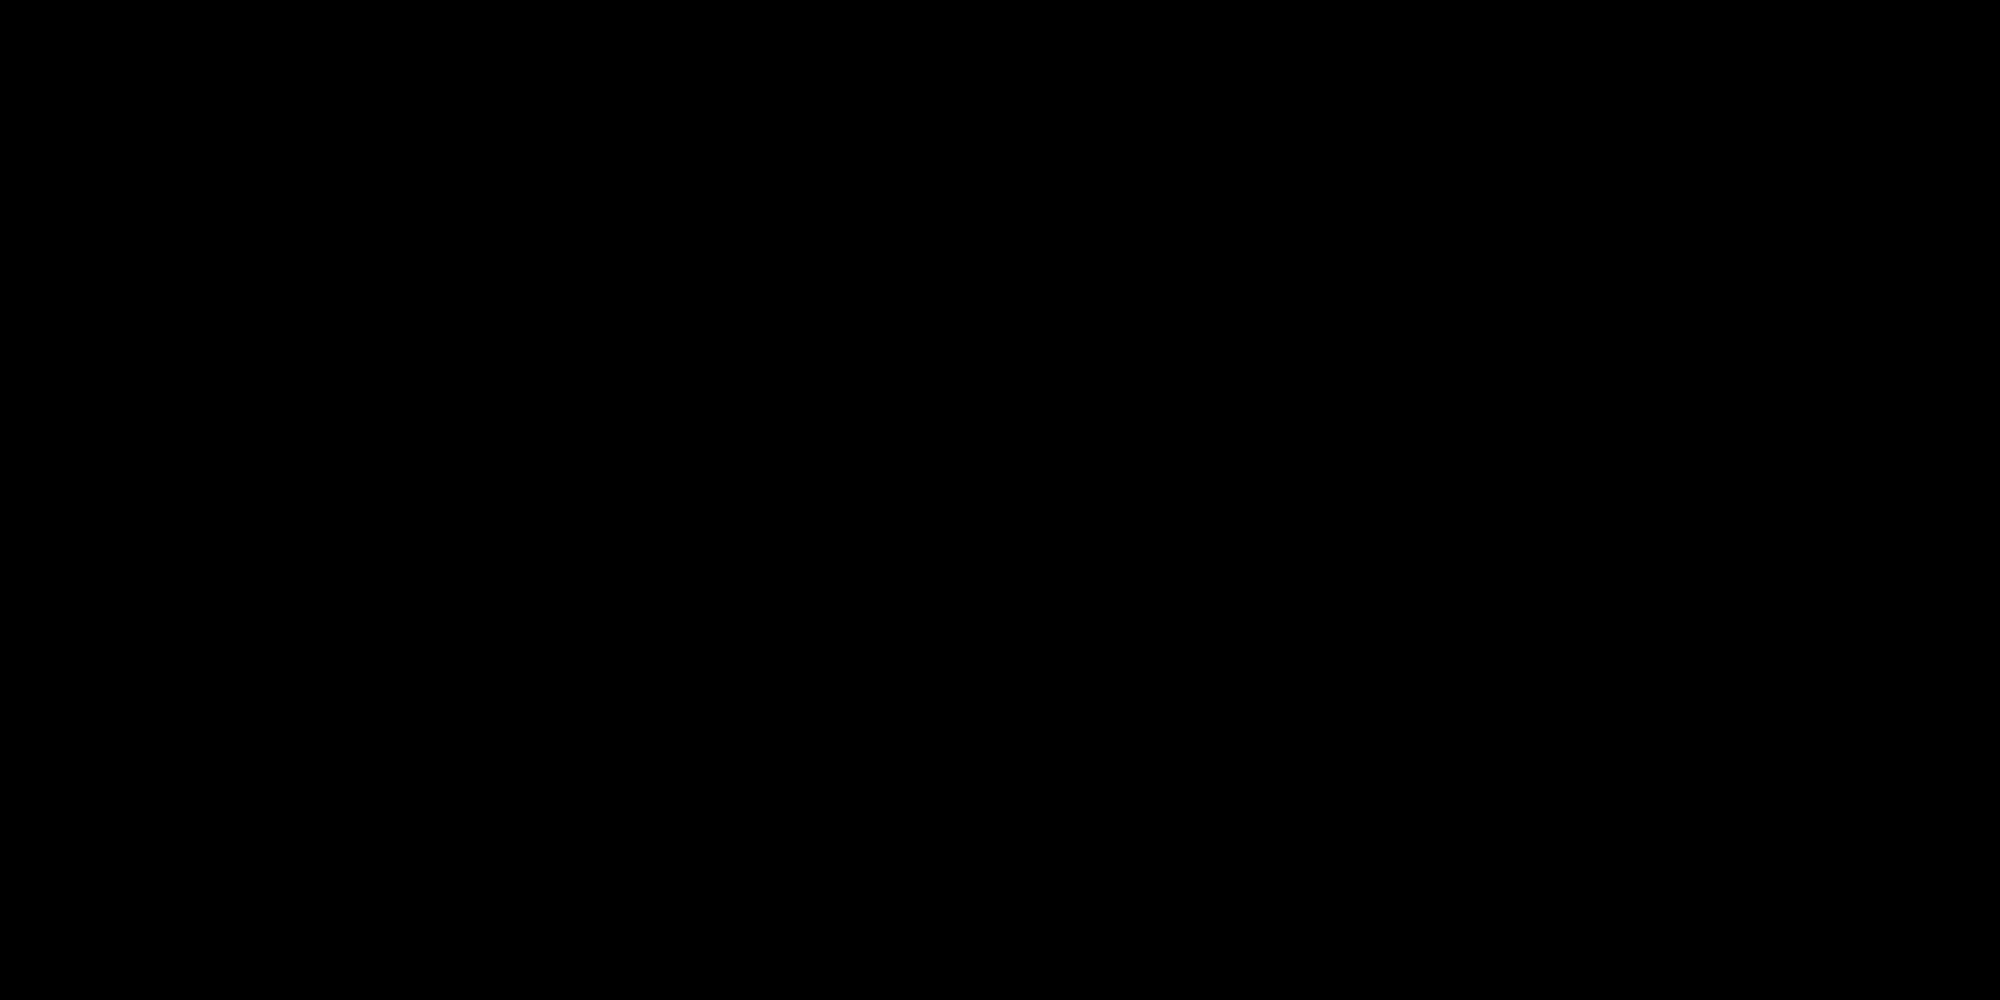 Panel Bottom 05